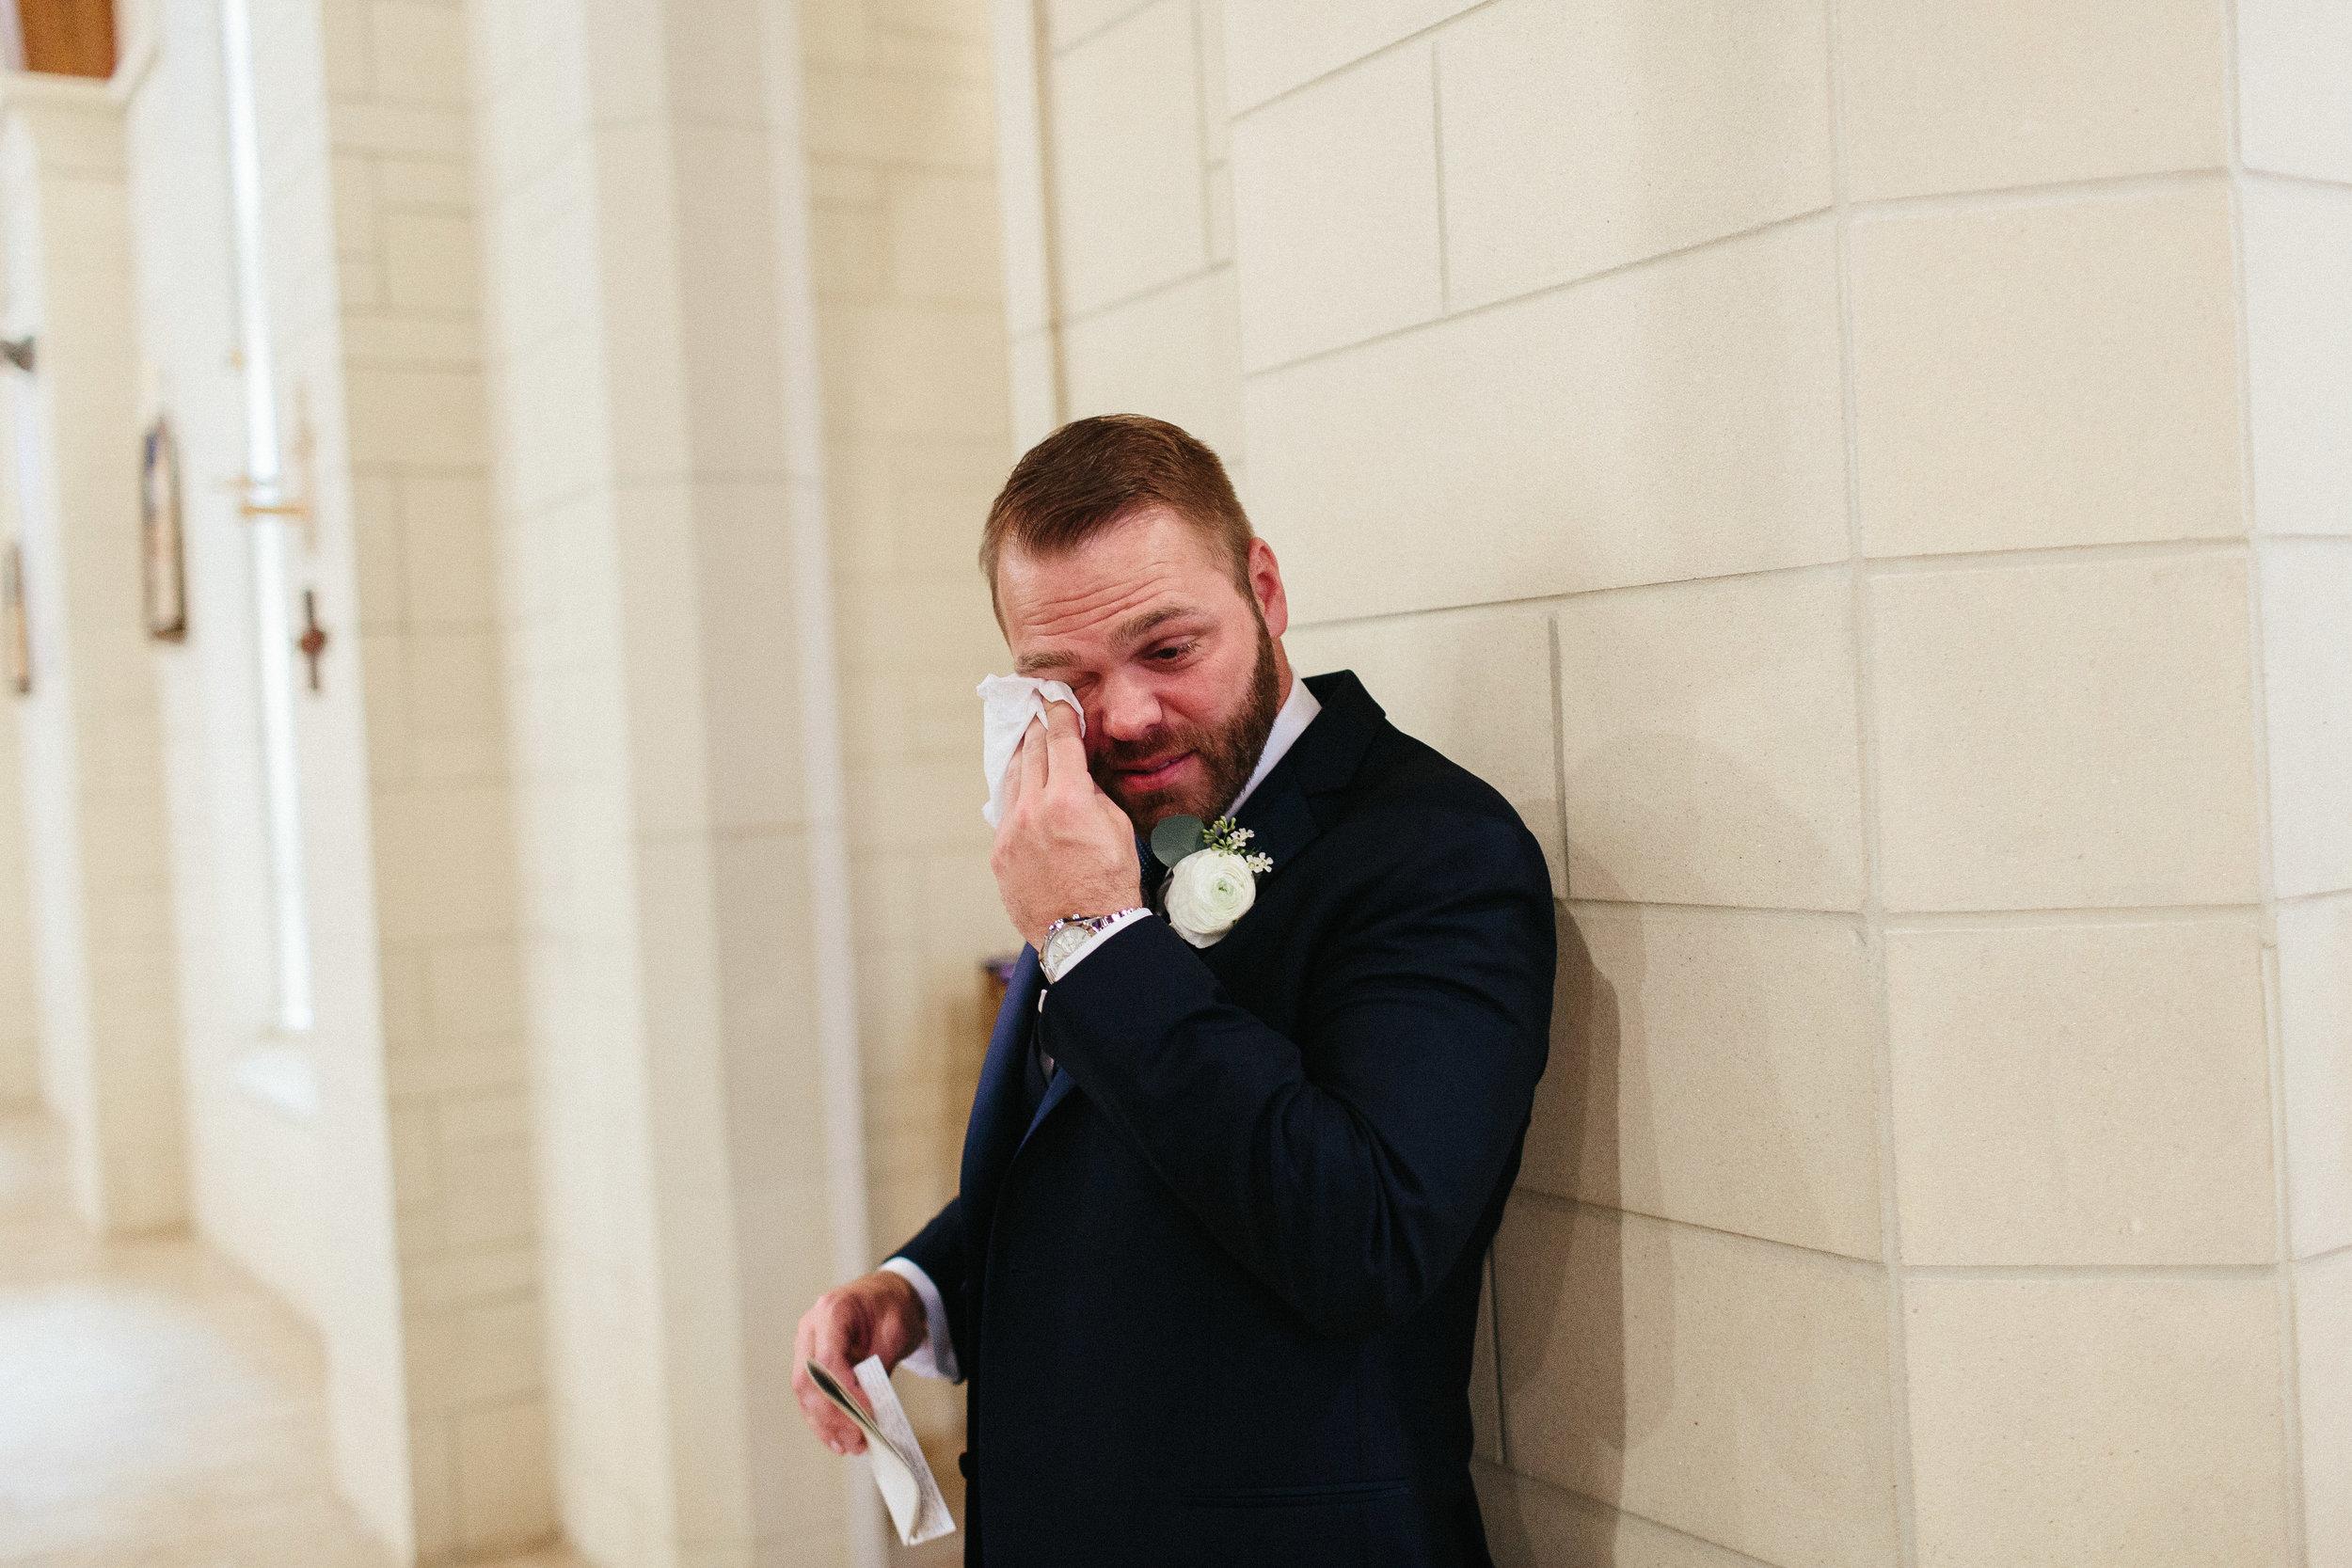 roswell_st_peter_chanel_catholic_avalon_hotel_alpharetta_wedding-1237.jpg